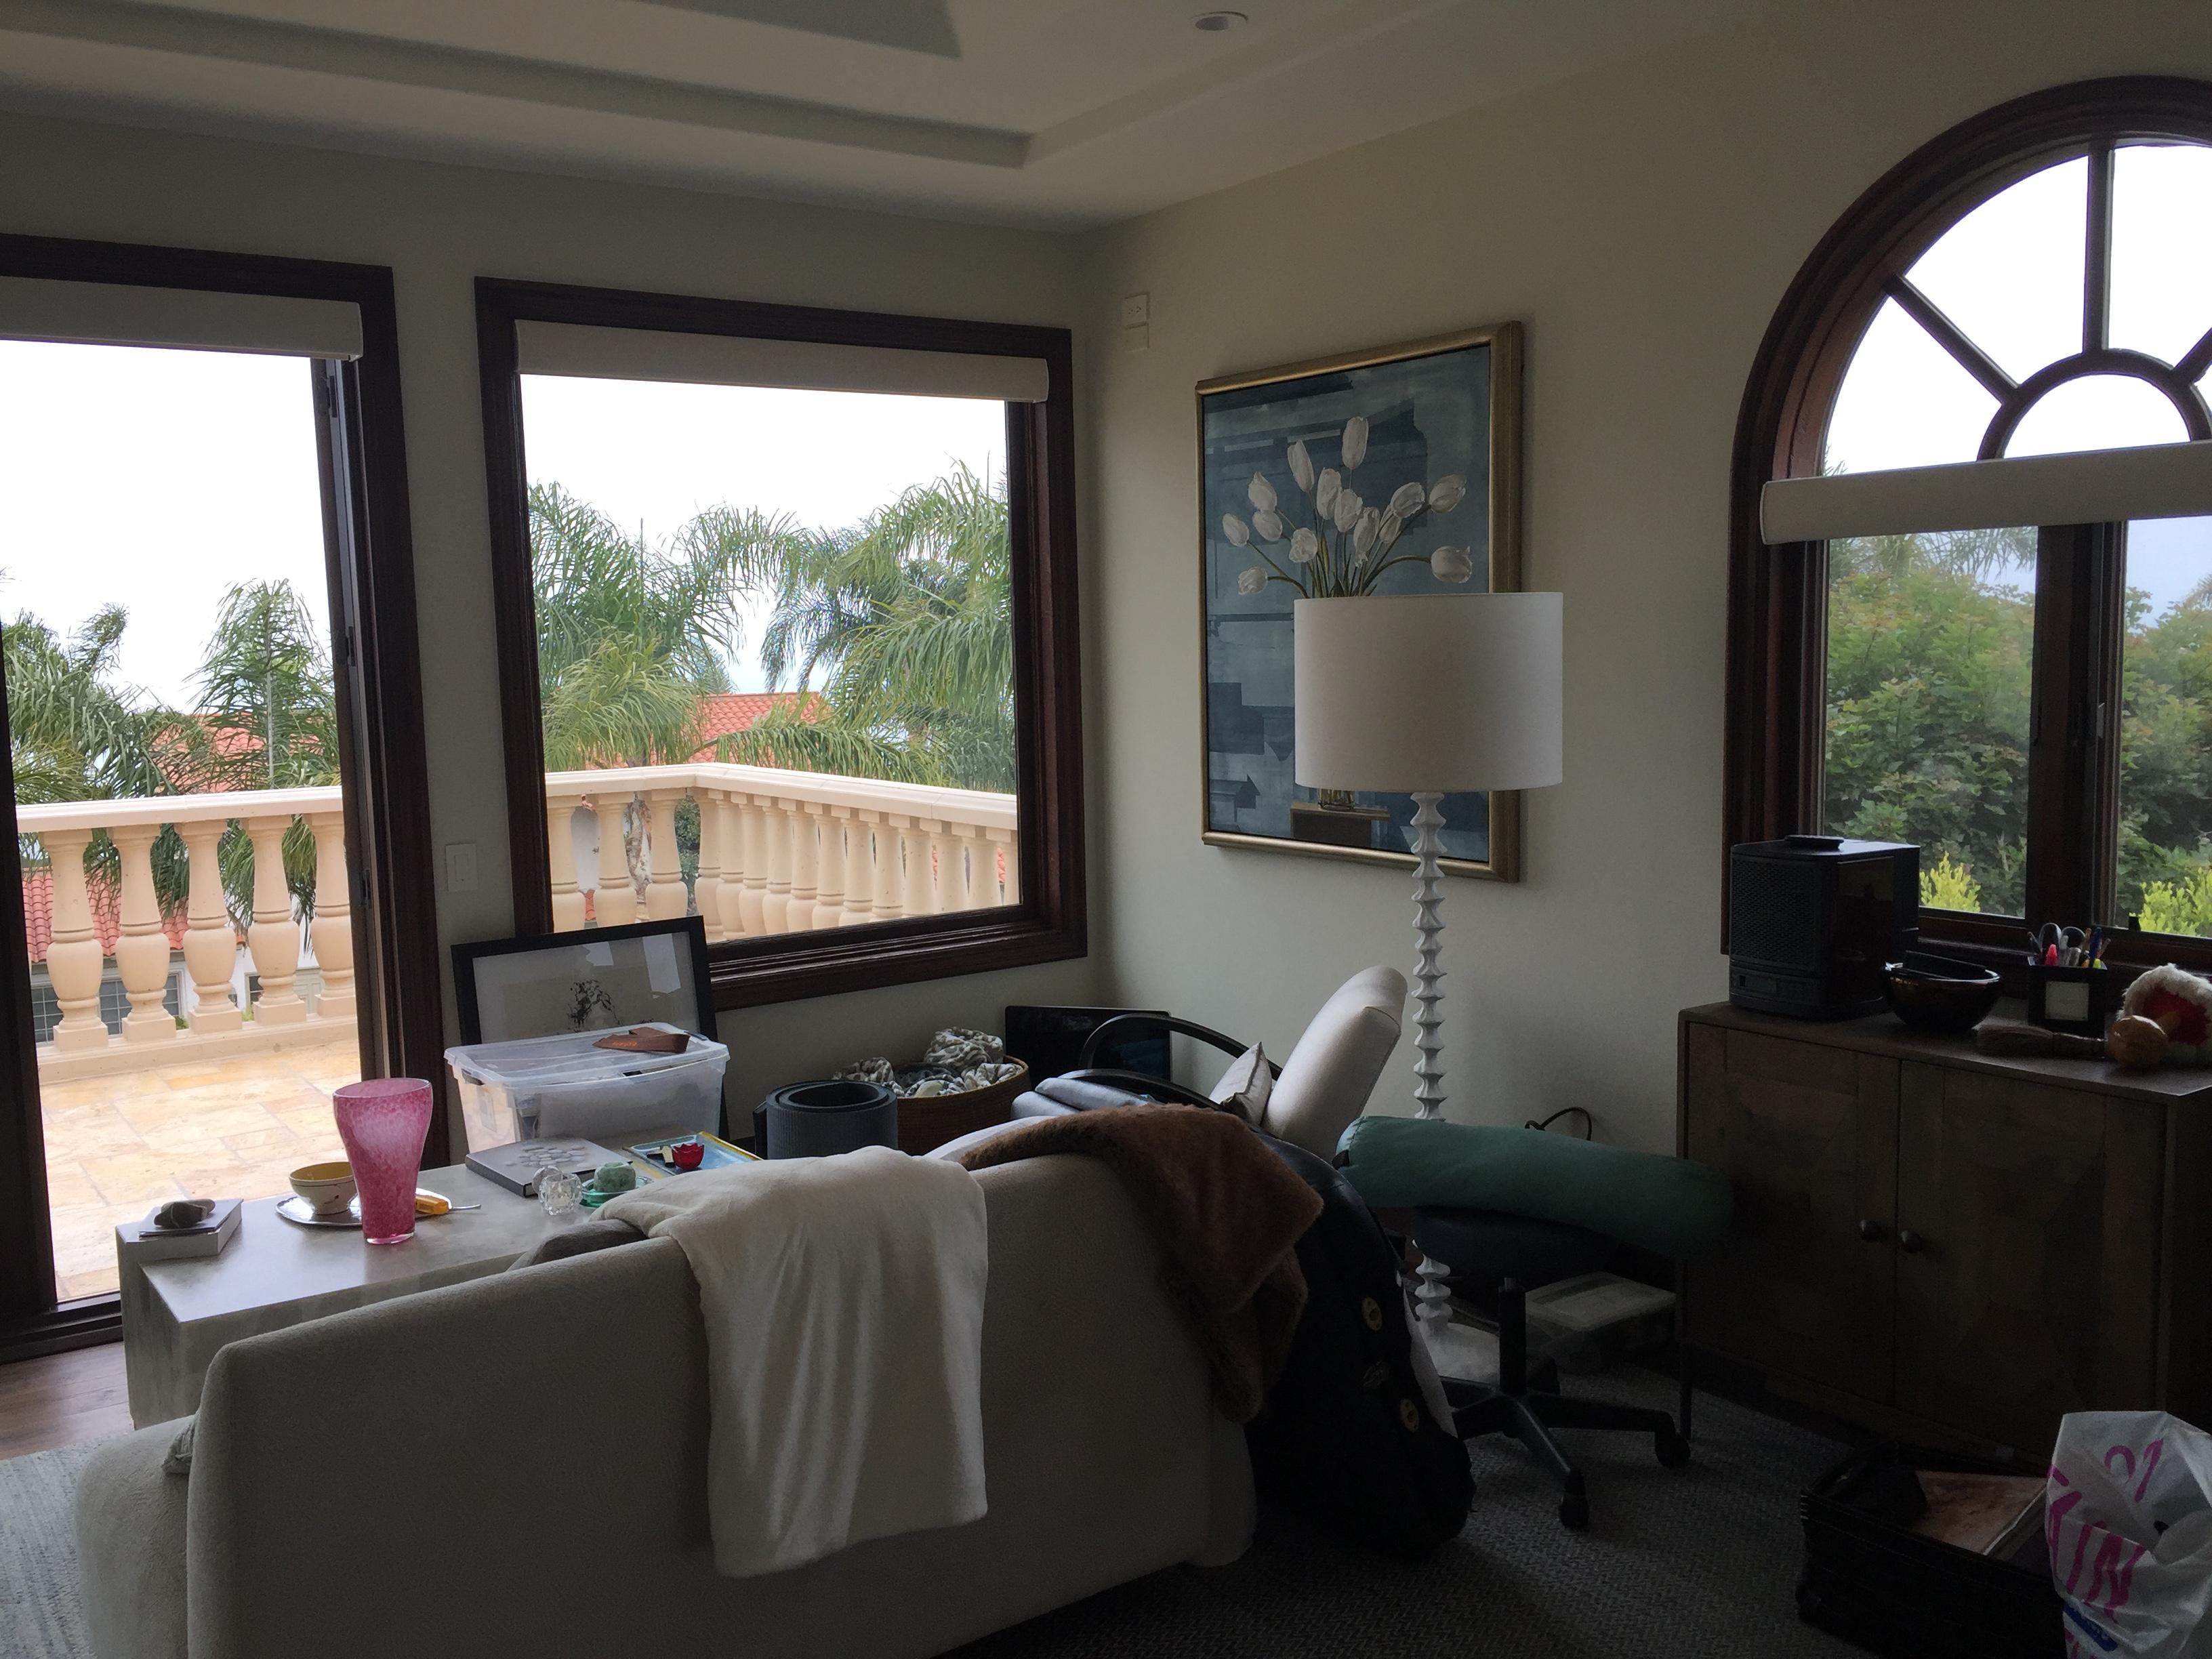 Window Screens in Calabasas